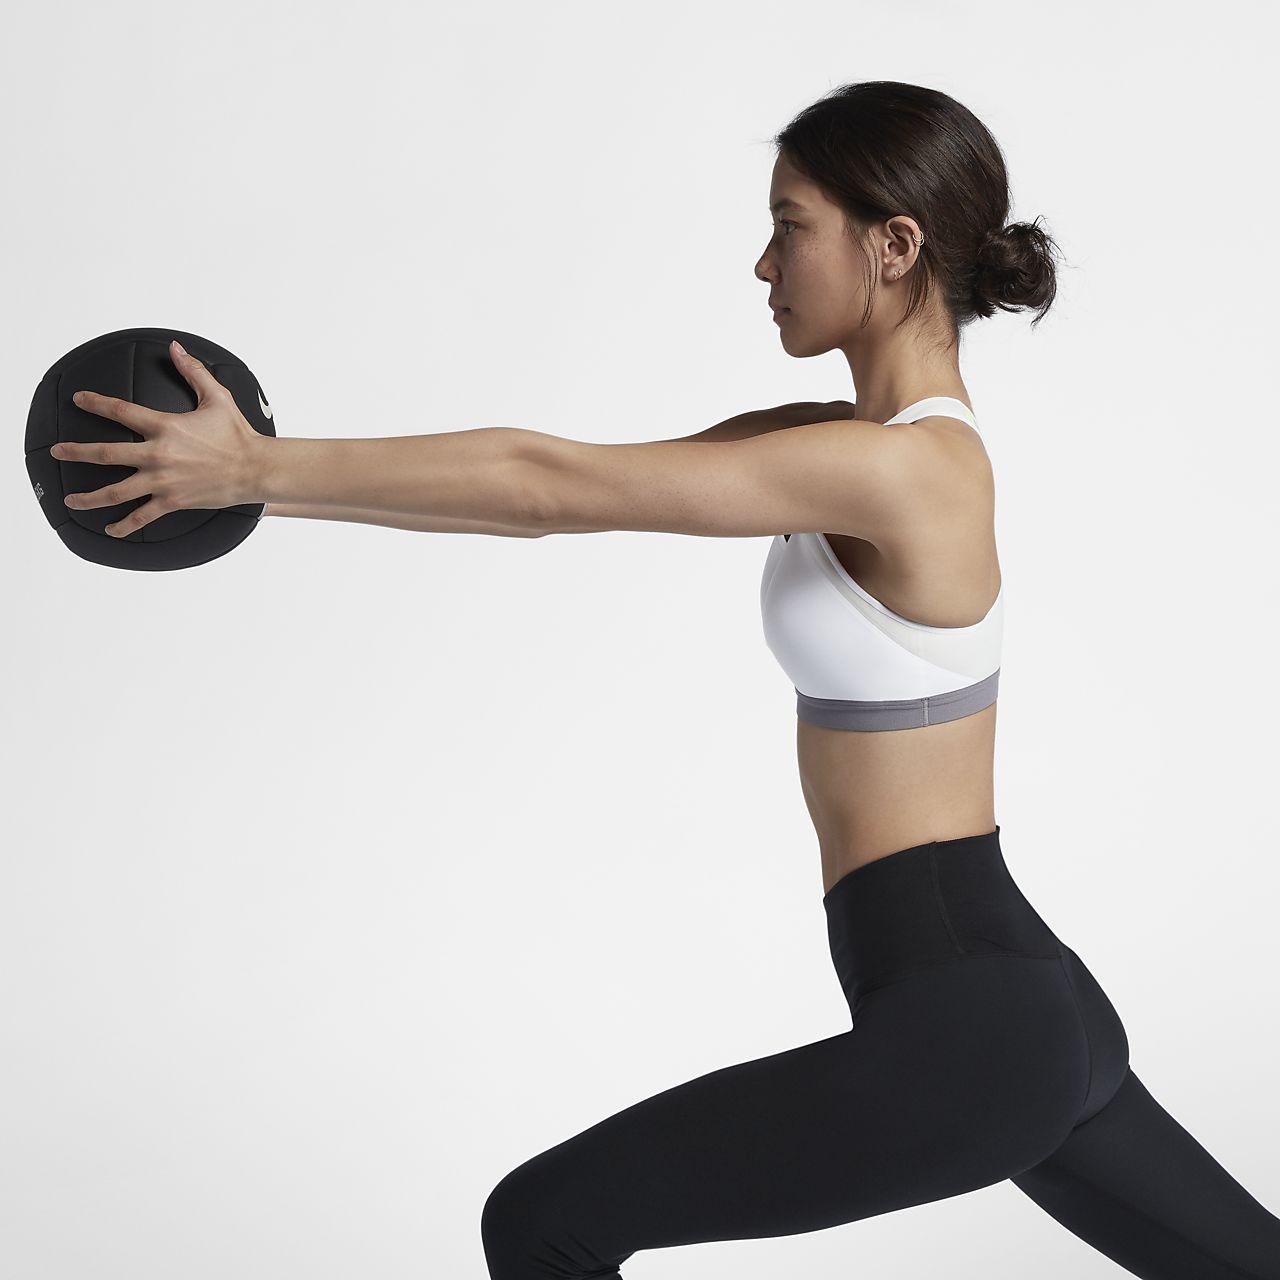 0756d3442cfb6 Nike Motion Adapt Women s Sports Bra. Nike.com